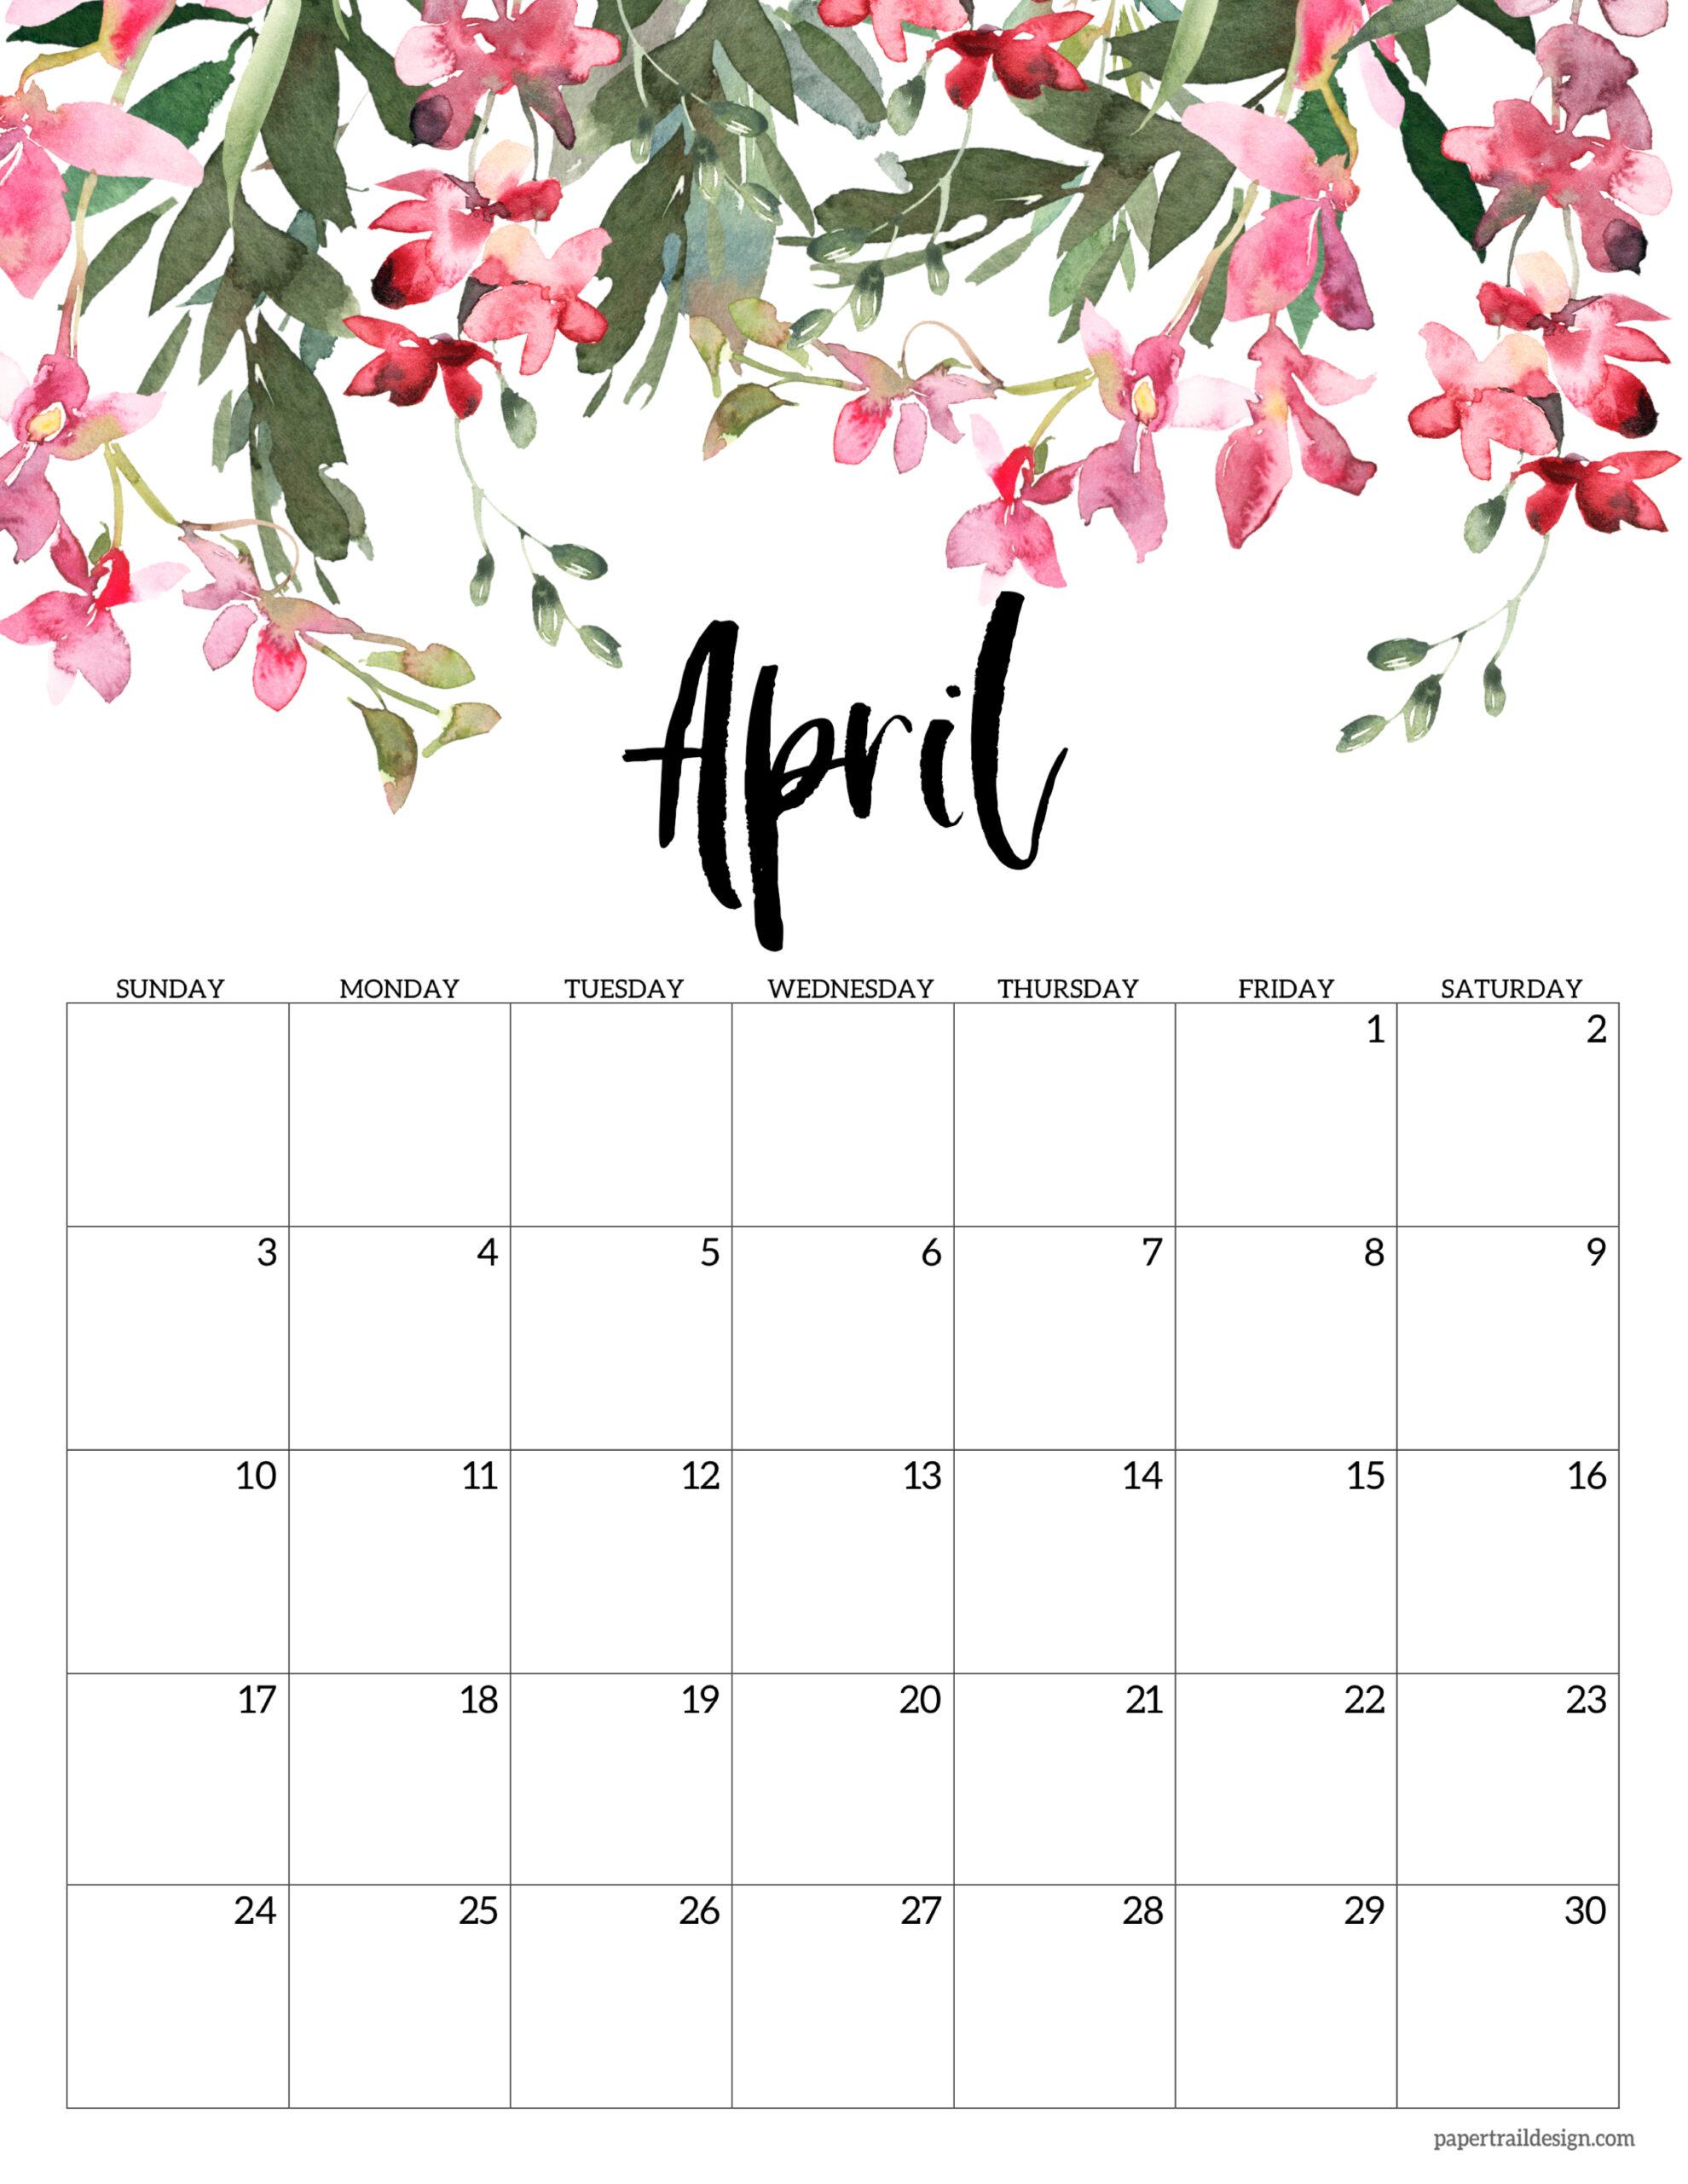 April 2022 Calendar Printable.Free 2022 Calendar Printable Floral Paper Trail Design